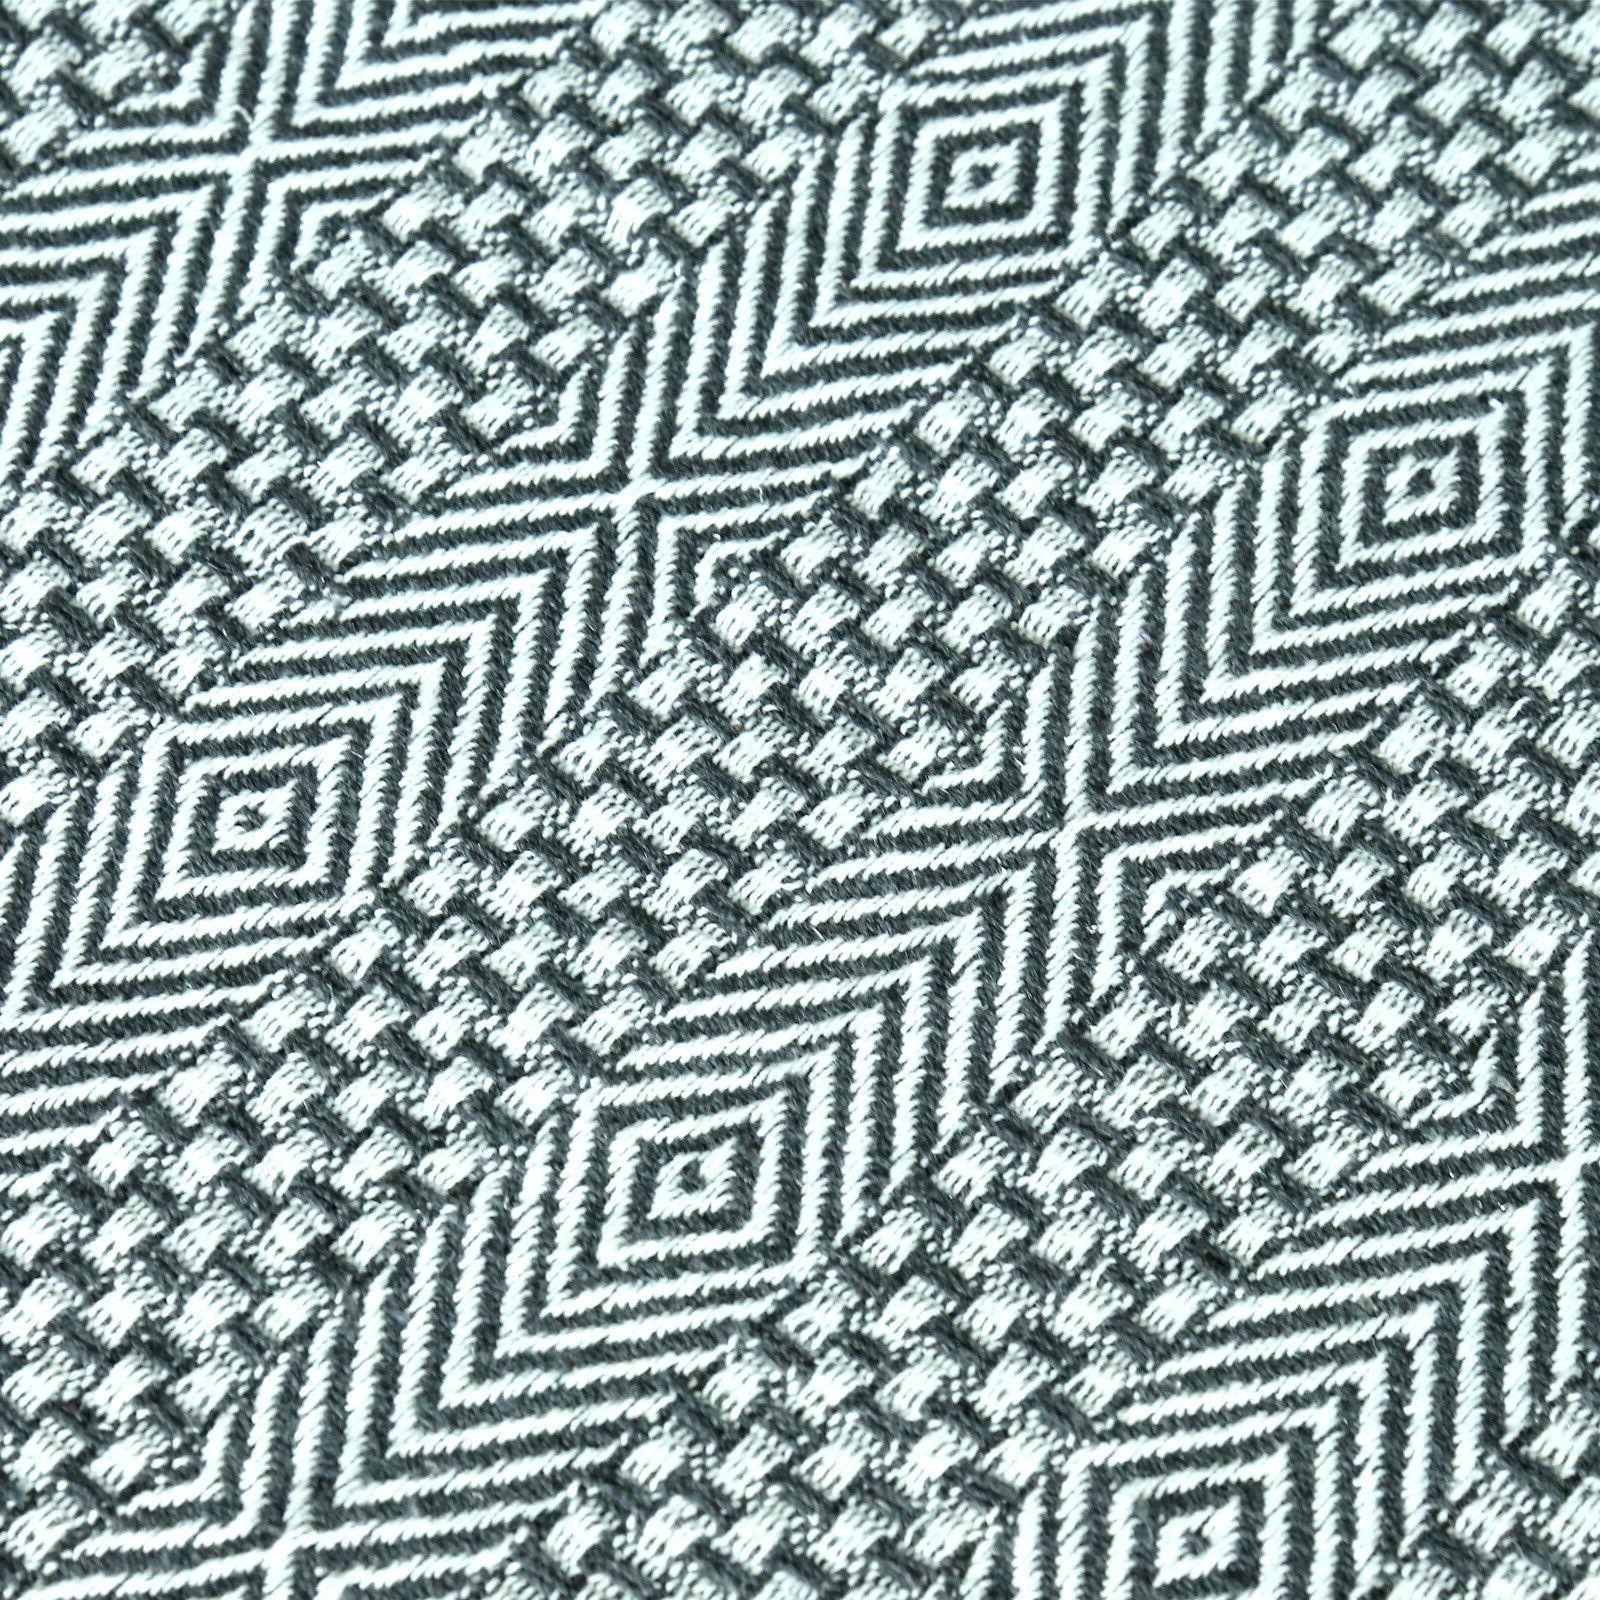 Cotton Gray Tassel Throw Woven Warm Throw Blanket 60